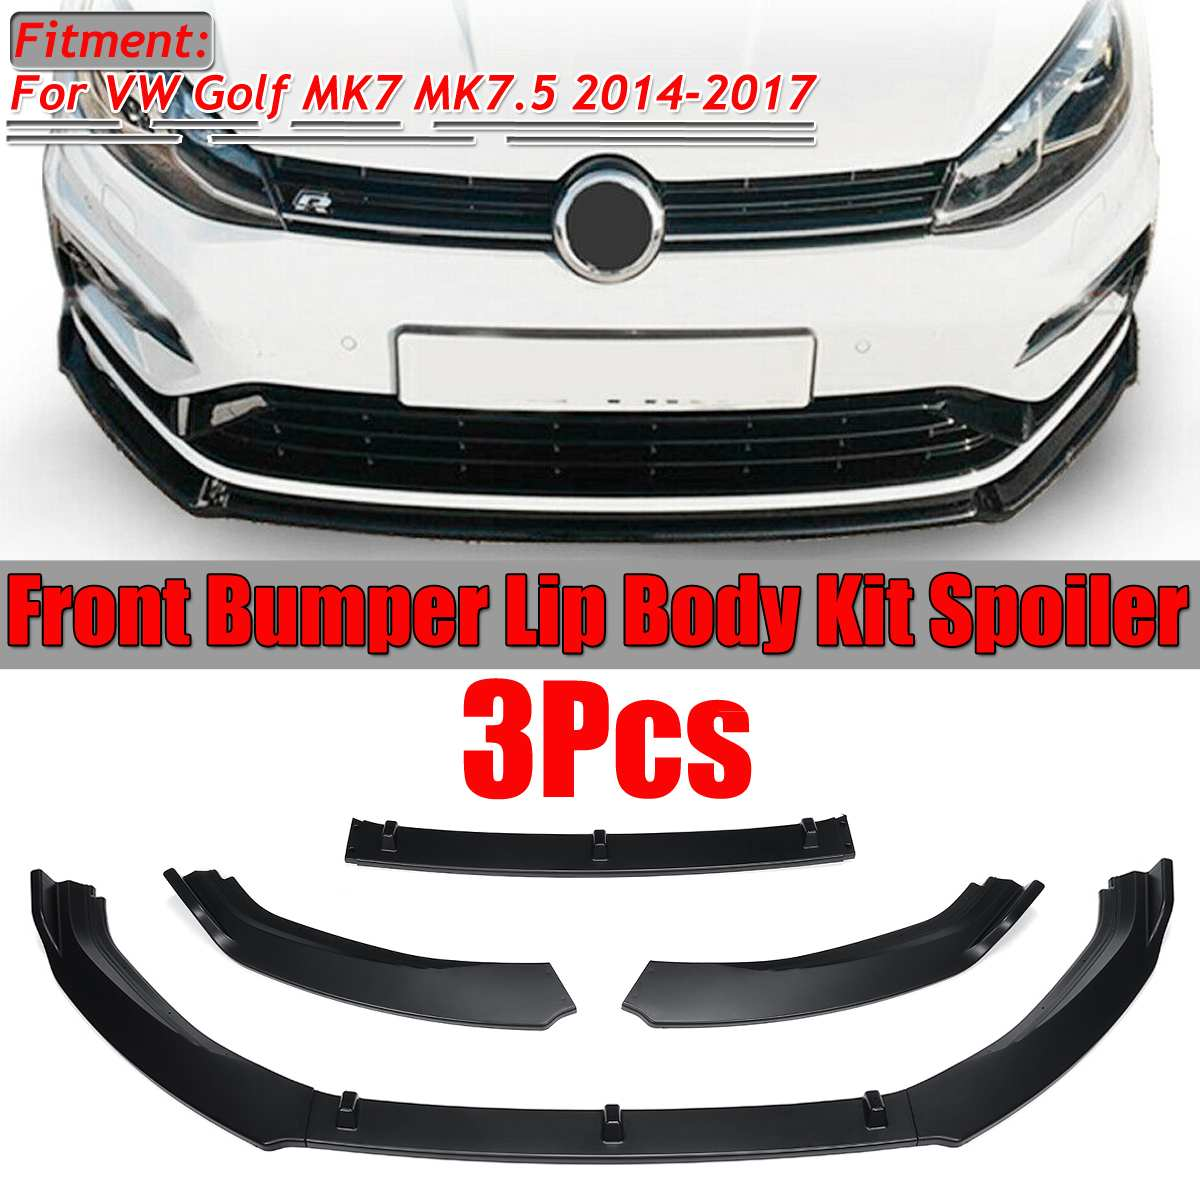 3PCS Car Front Bumper Splitter Lip Spoiler Diffuser Protector Guard Cover Trim For VW For Golf MK7 MK7.5 2014 2015 2016 2017